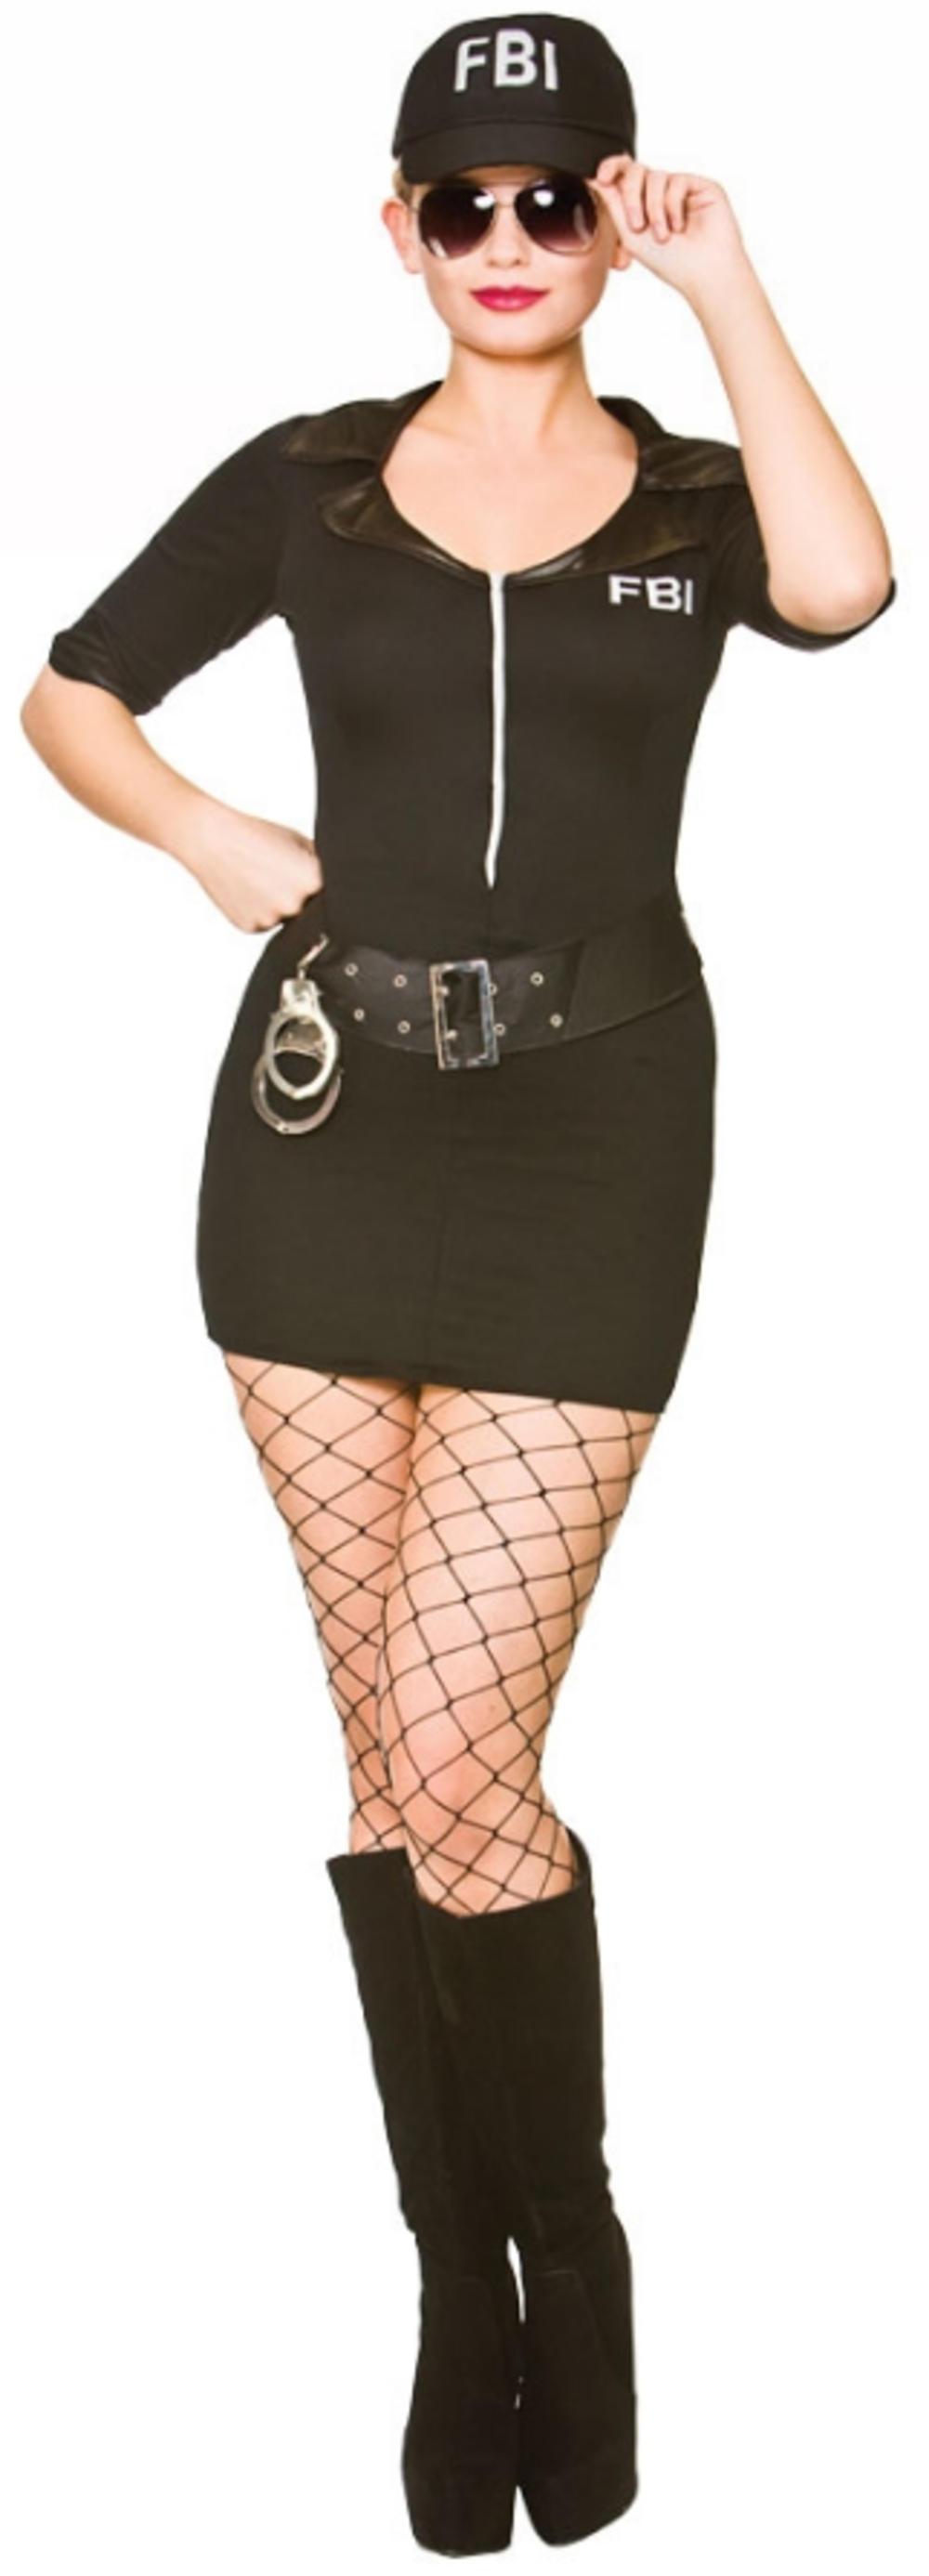 Sexy FBI Police Cop Ladies Fancy Dress Occupation Uniform Adults Womens Costume